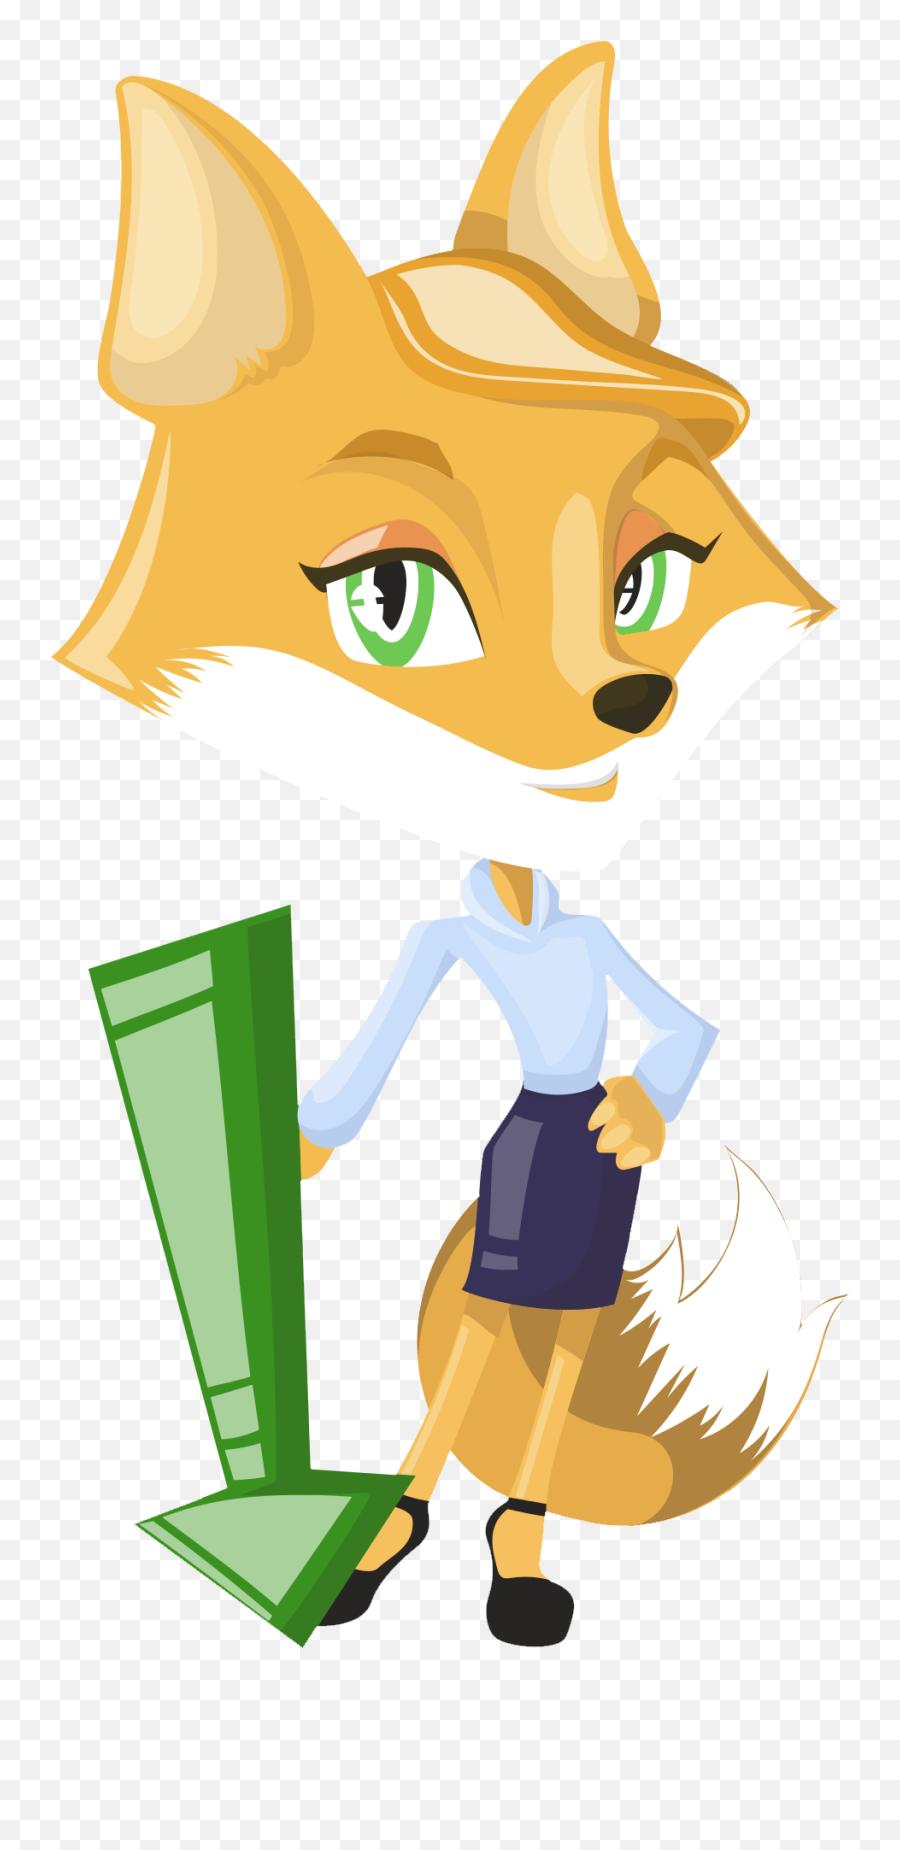 Fox Png And Vectors For Free Download - Dlpngcom Portable Network Graphics Emoji,Fox Emoticon